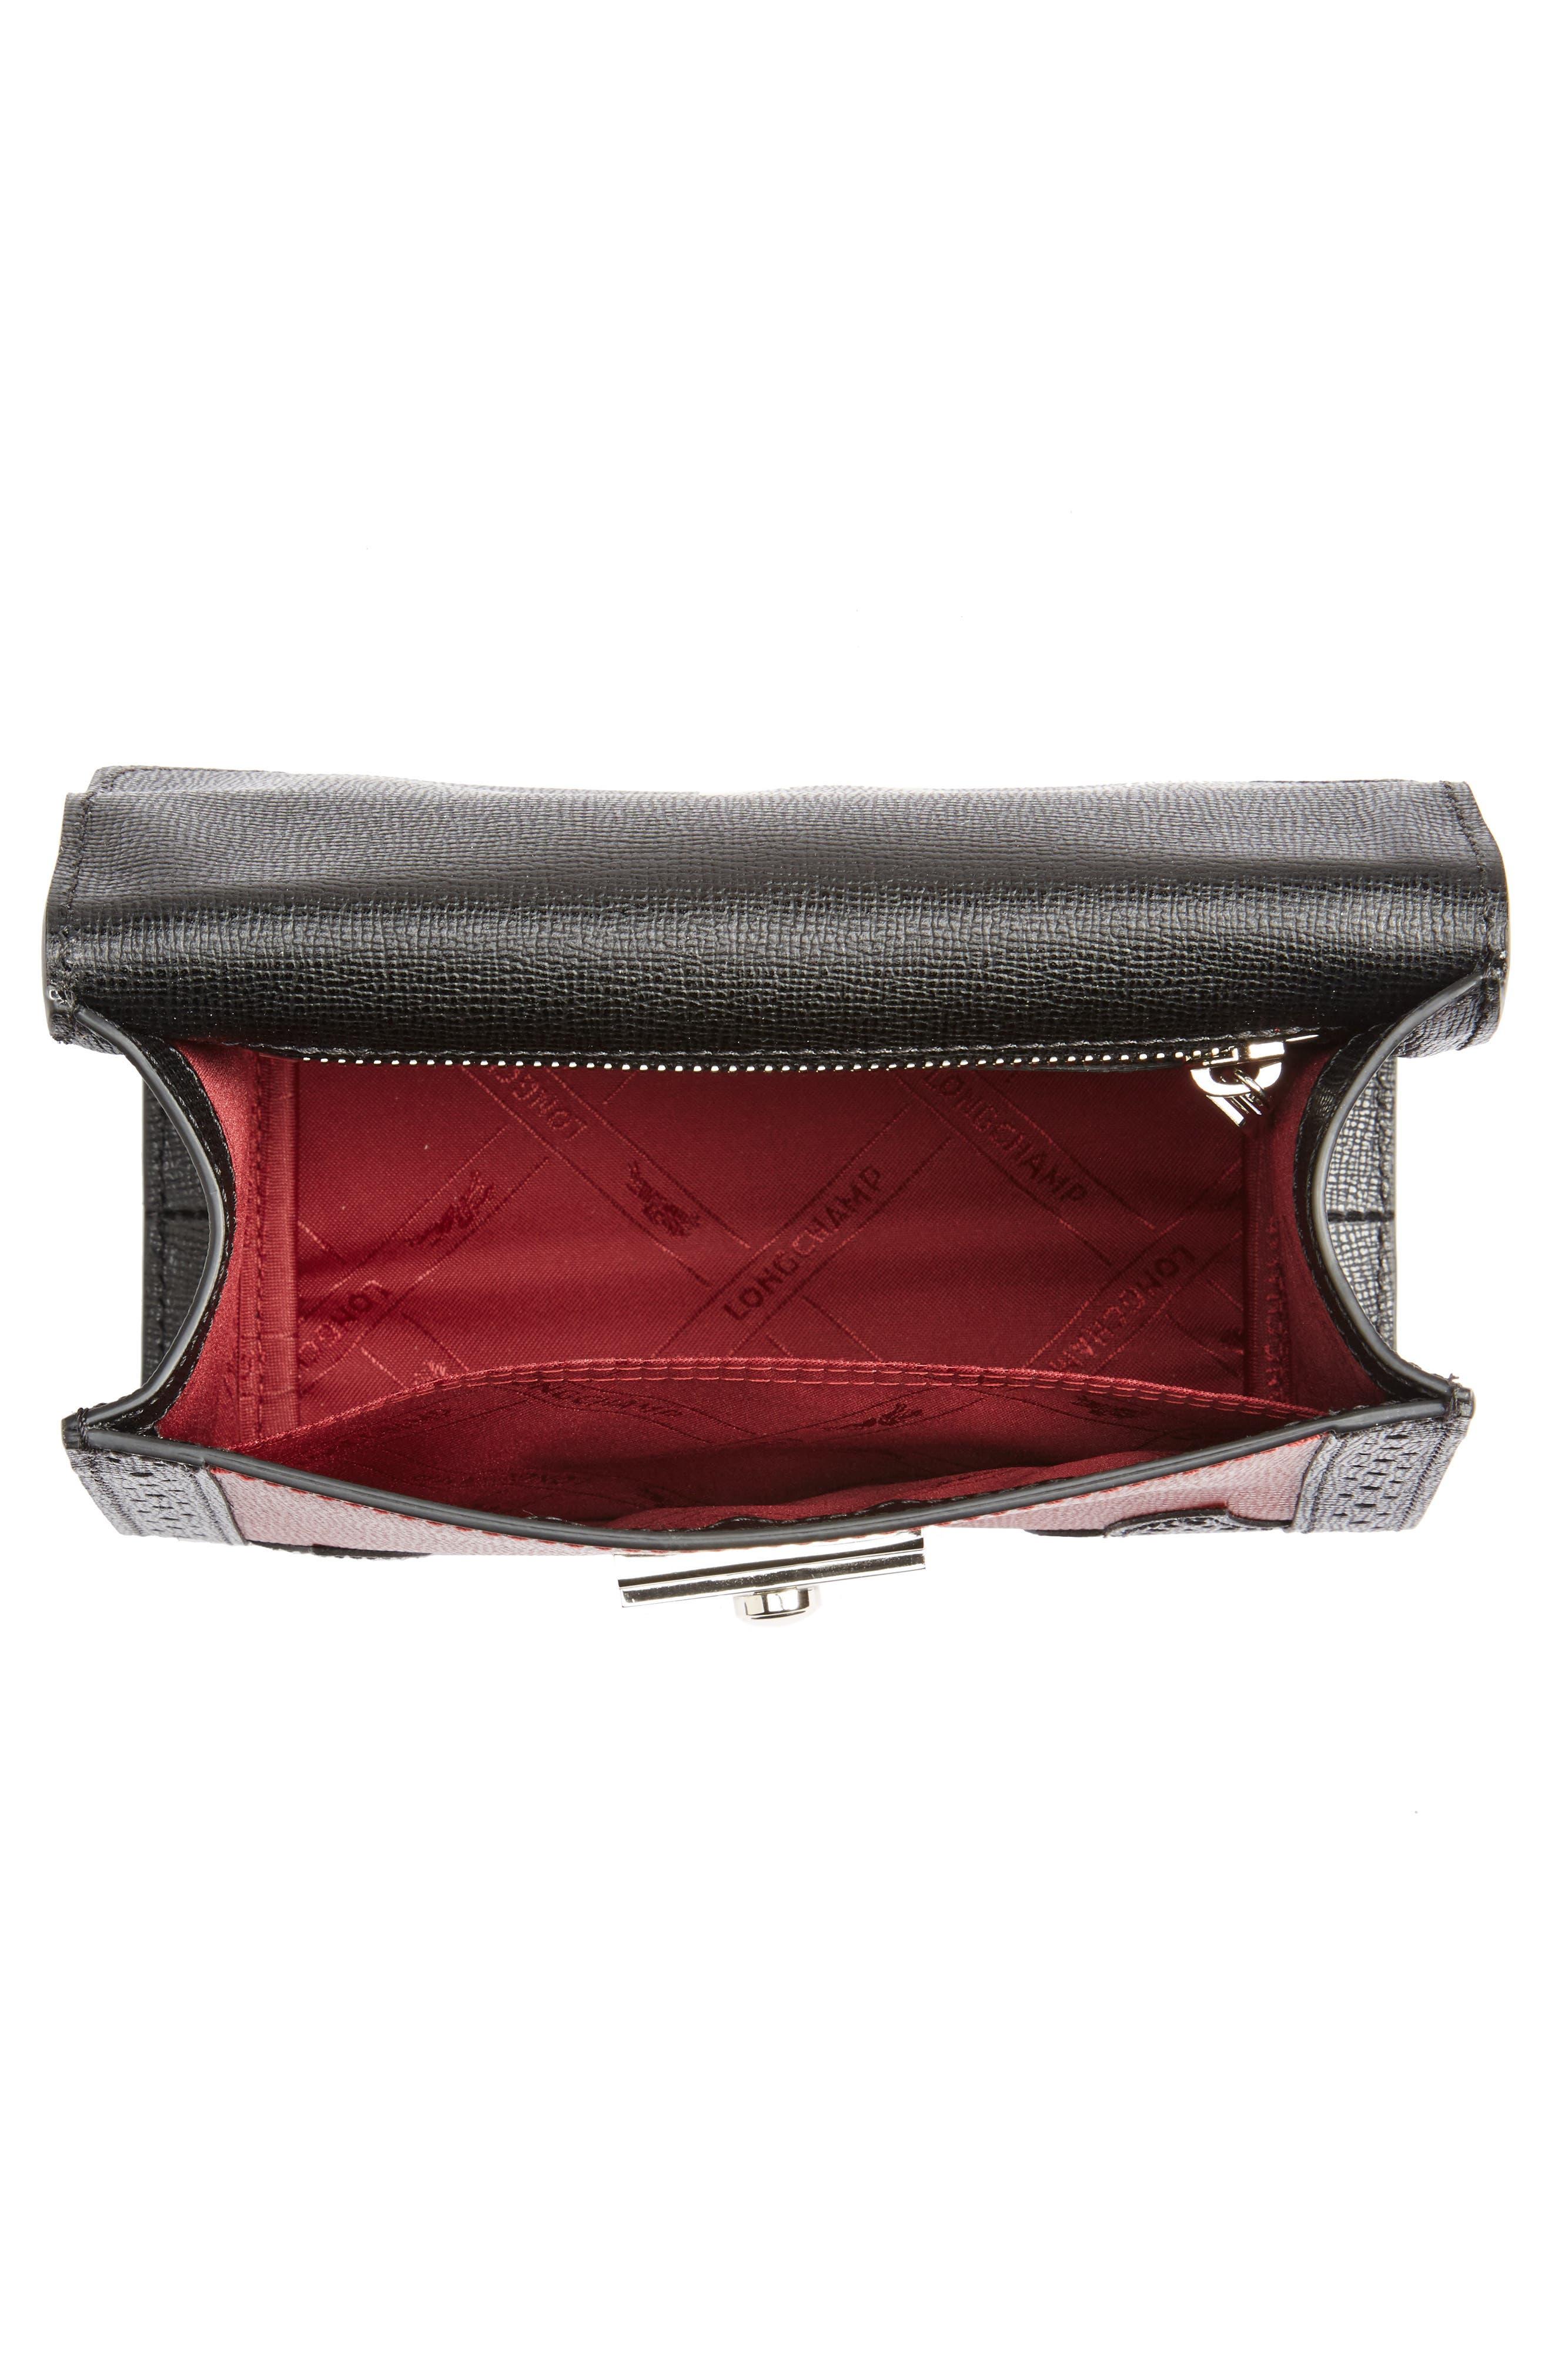 LONGCHAMP,                             Effrontée Leather Crossbody Bag,                             Alternate thumbnail 4, color,                             618